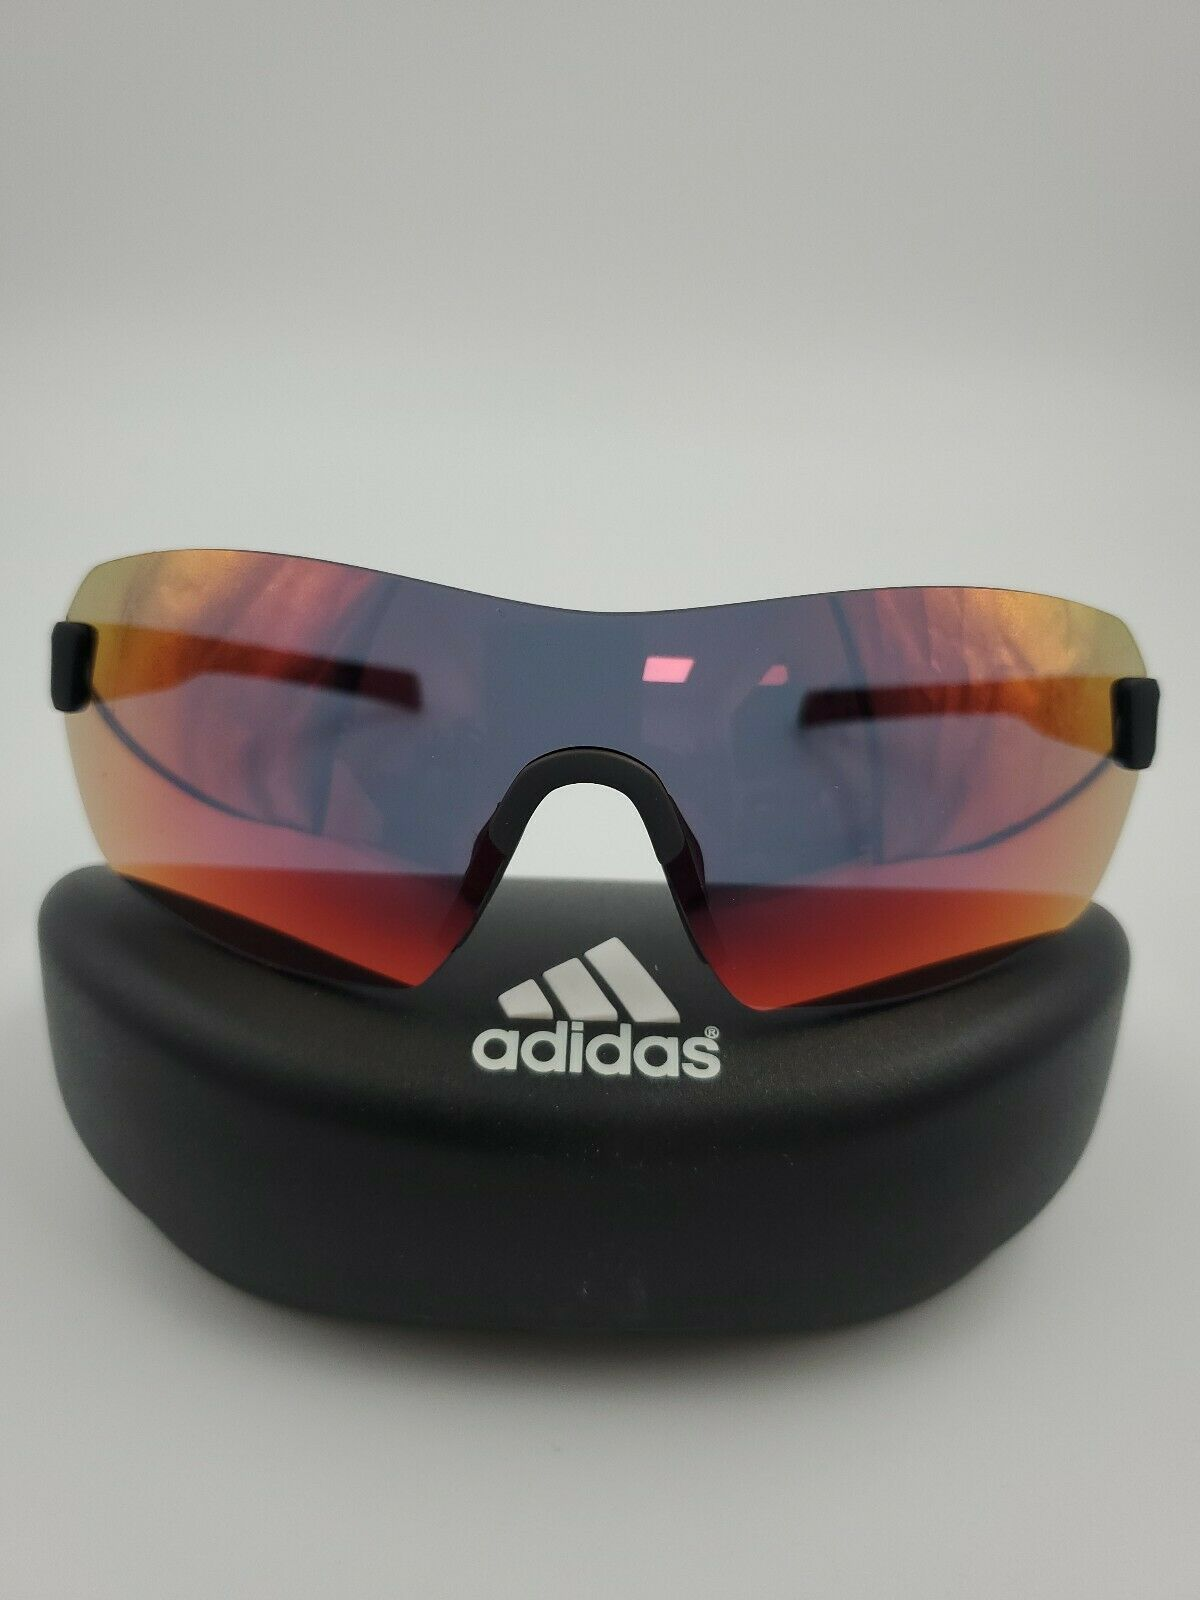 Falsificación Polvoriento Engaño  adidas arriba sunglasses Online Shopping for Women, Men, Kids Fashion &  Lifestyle|Free Delivery & Returns! -